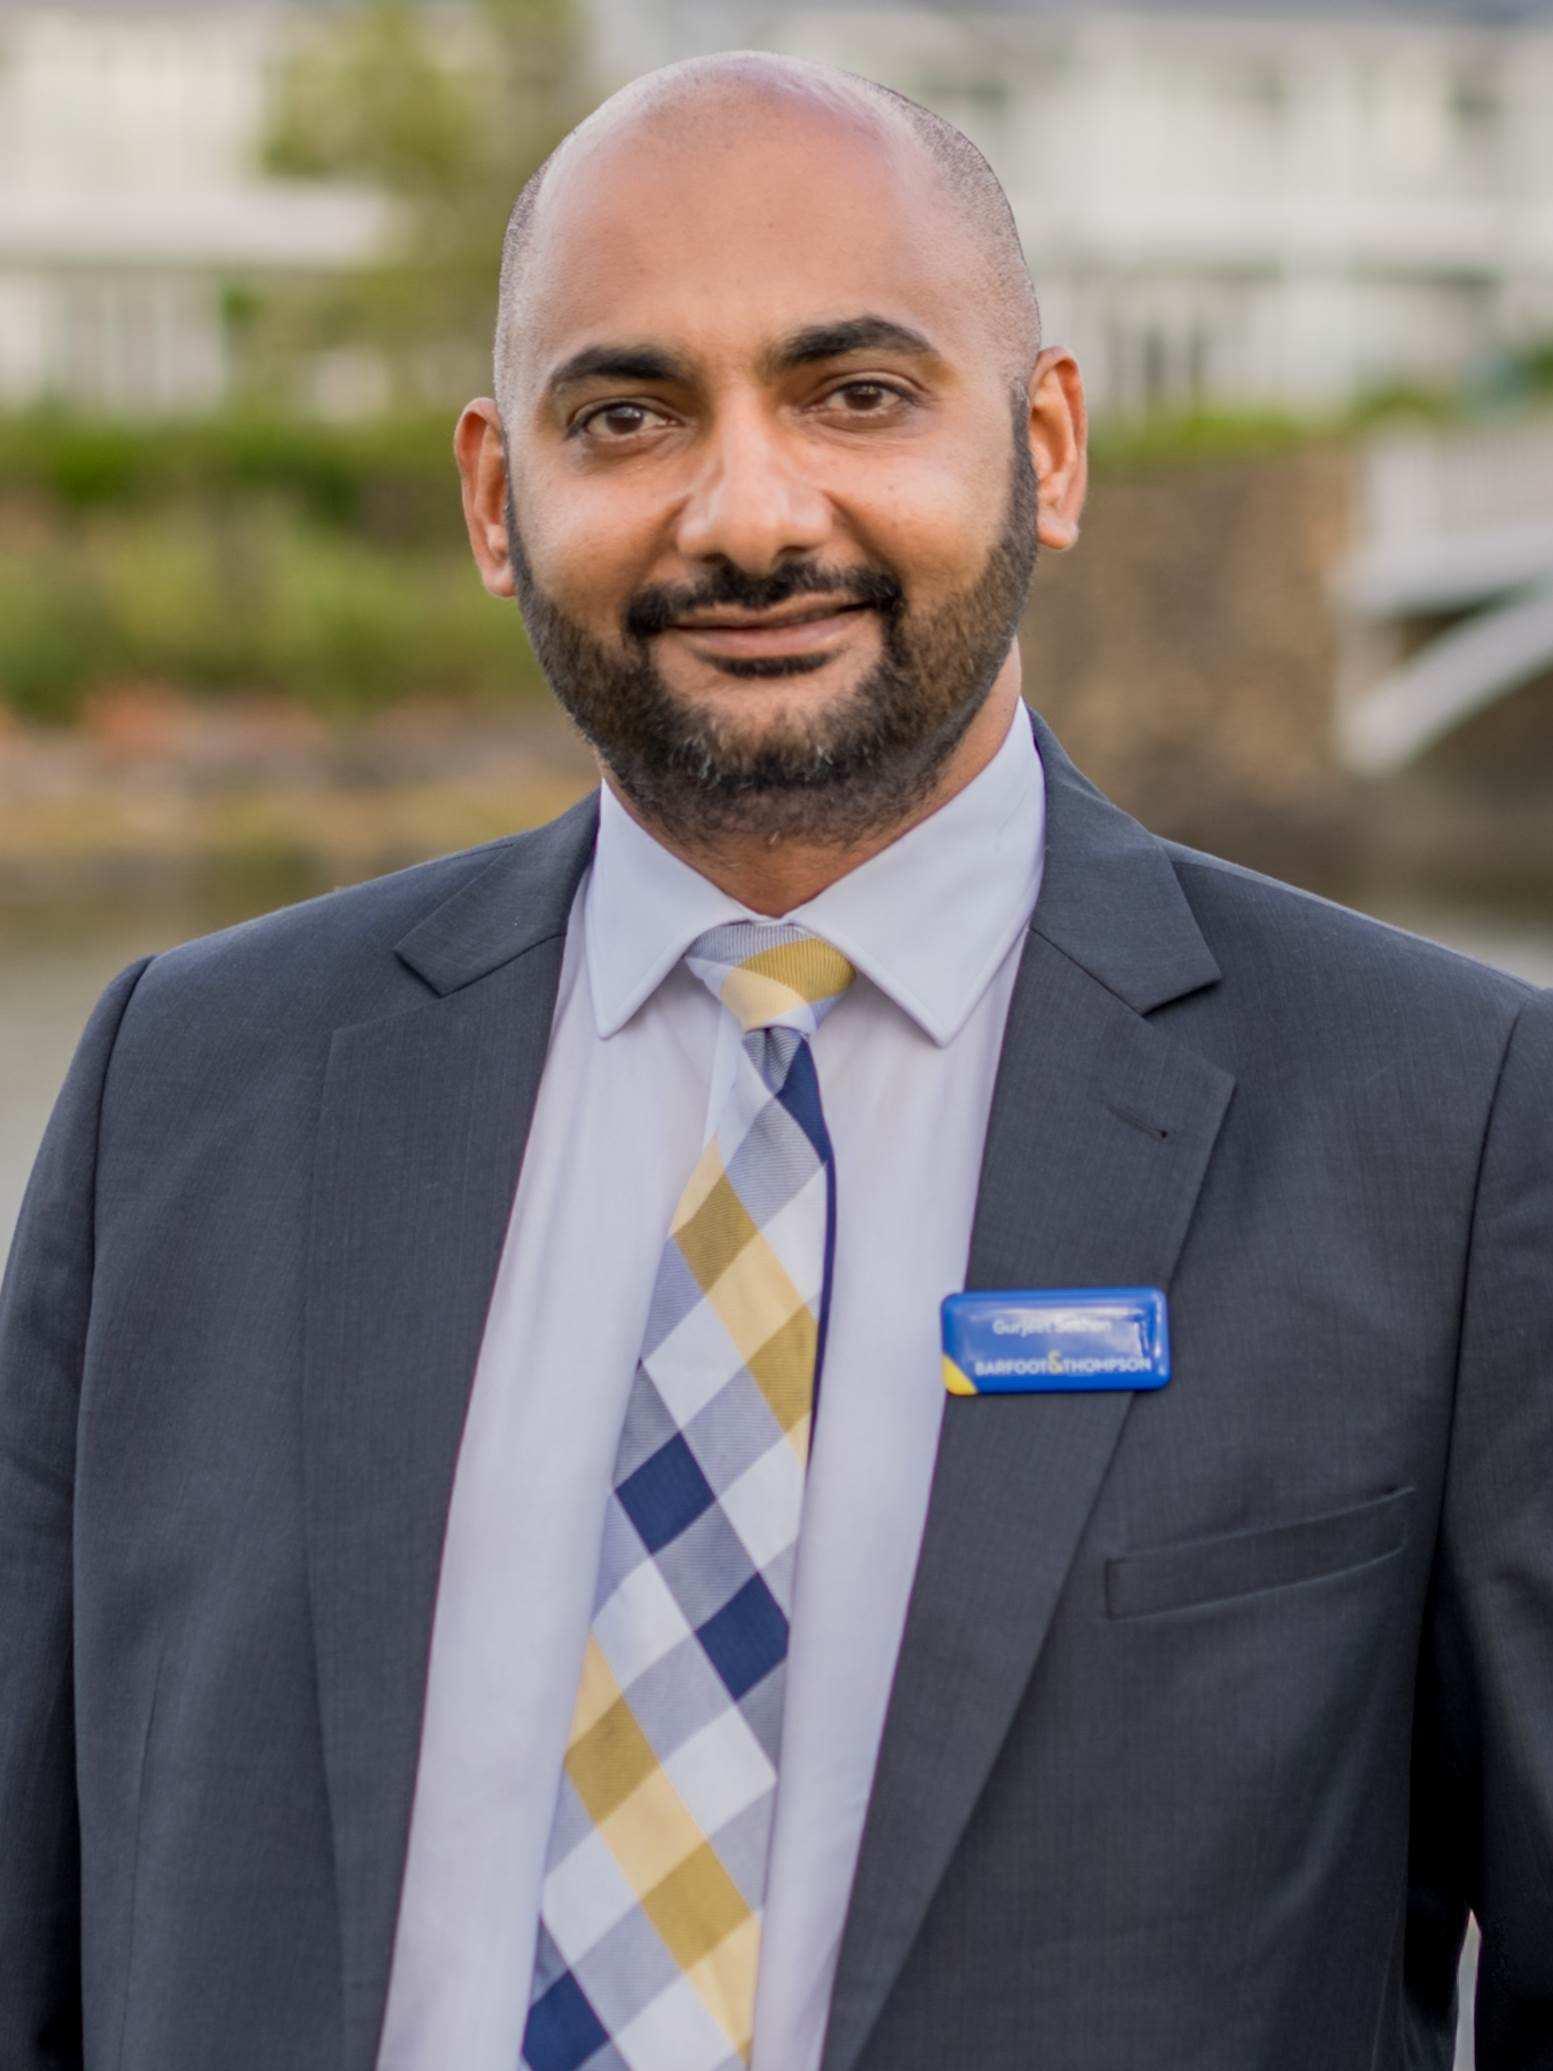 Gurjeet Sekhon